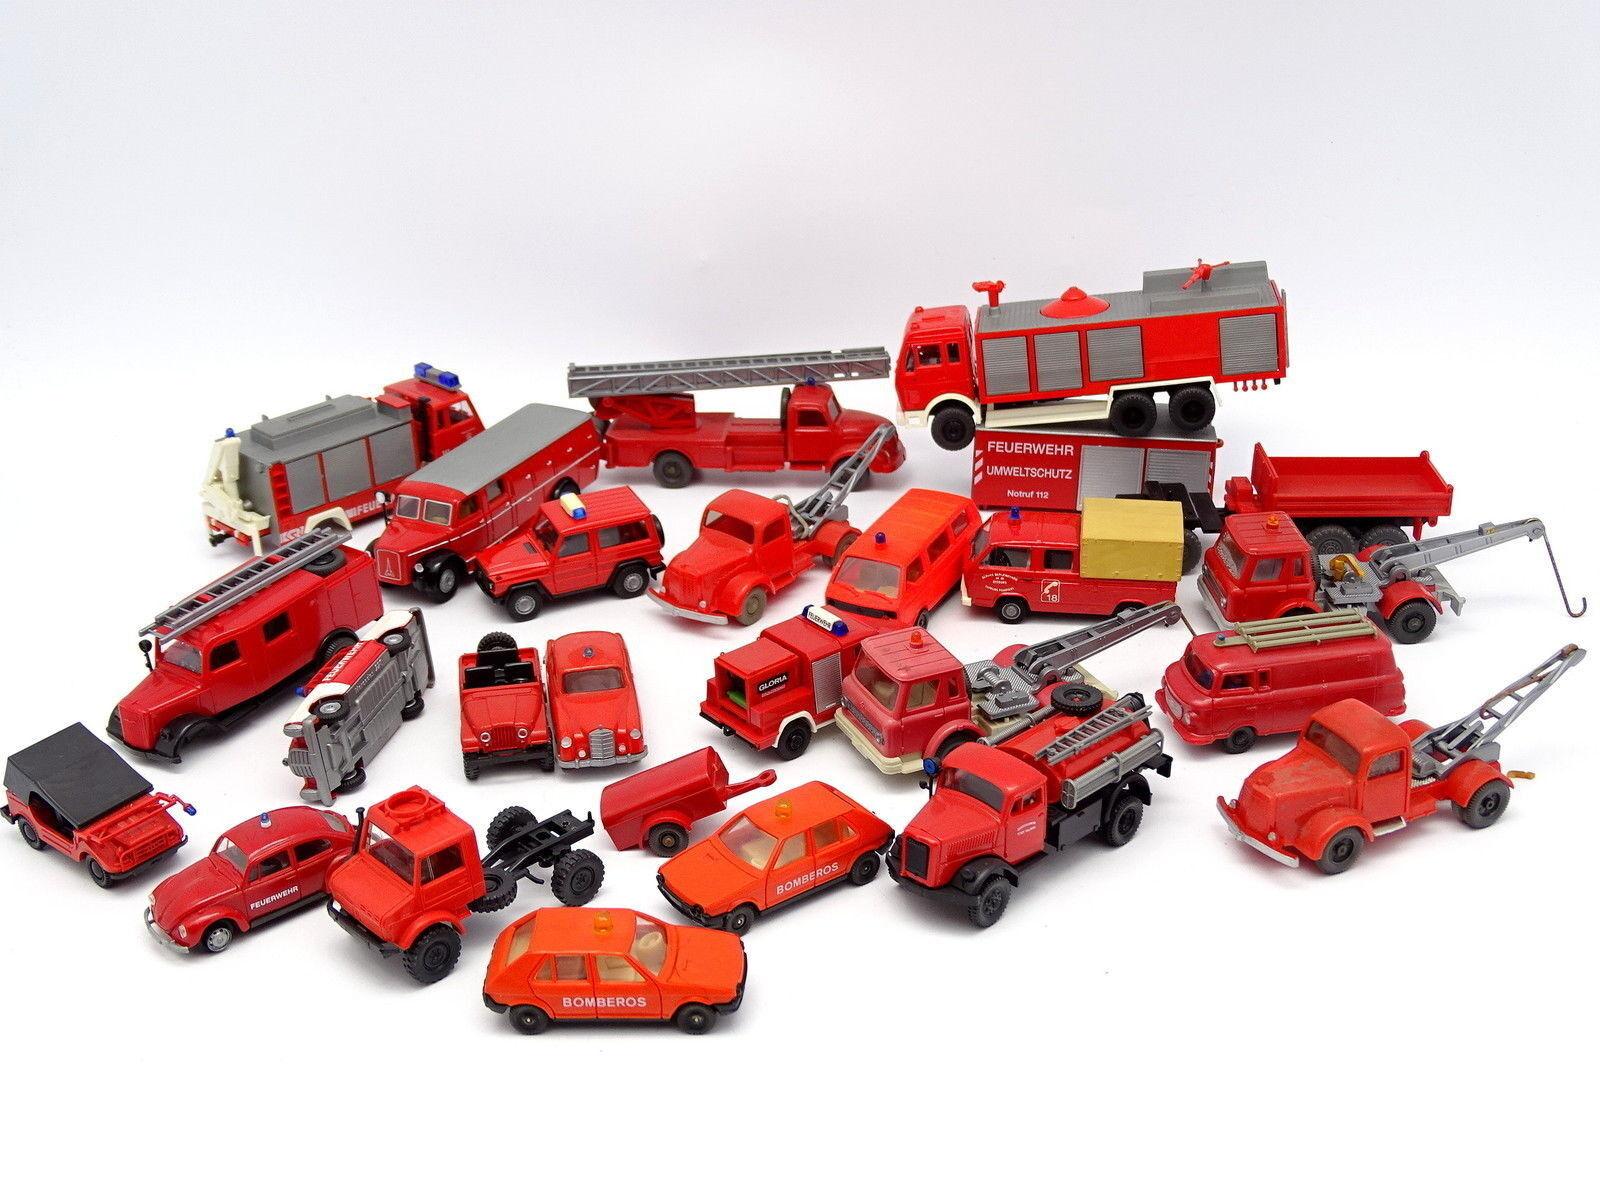 costo real Divers 1 87 HO - Lot de 24 24 24 véhicules Pompiers Feuerwehr   Fiat Mercedes Magirus  promociones emocionantes